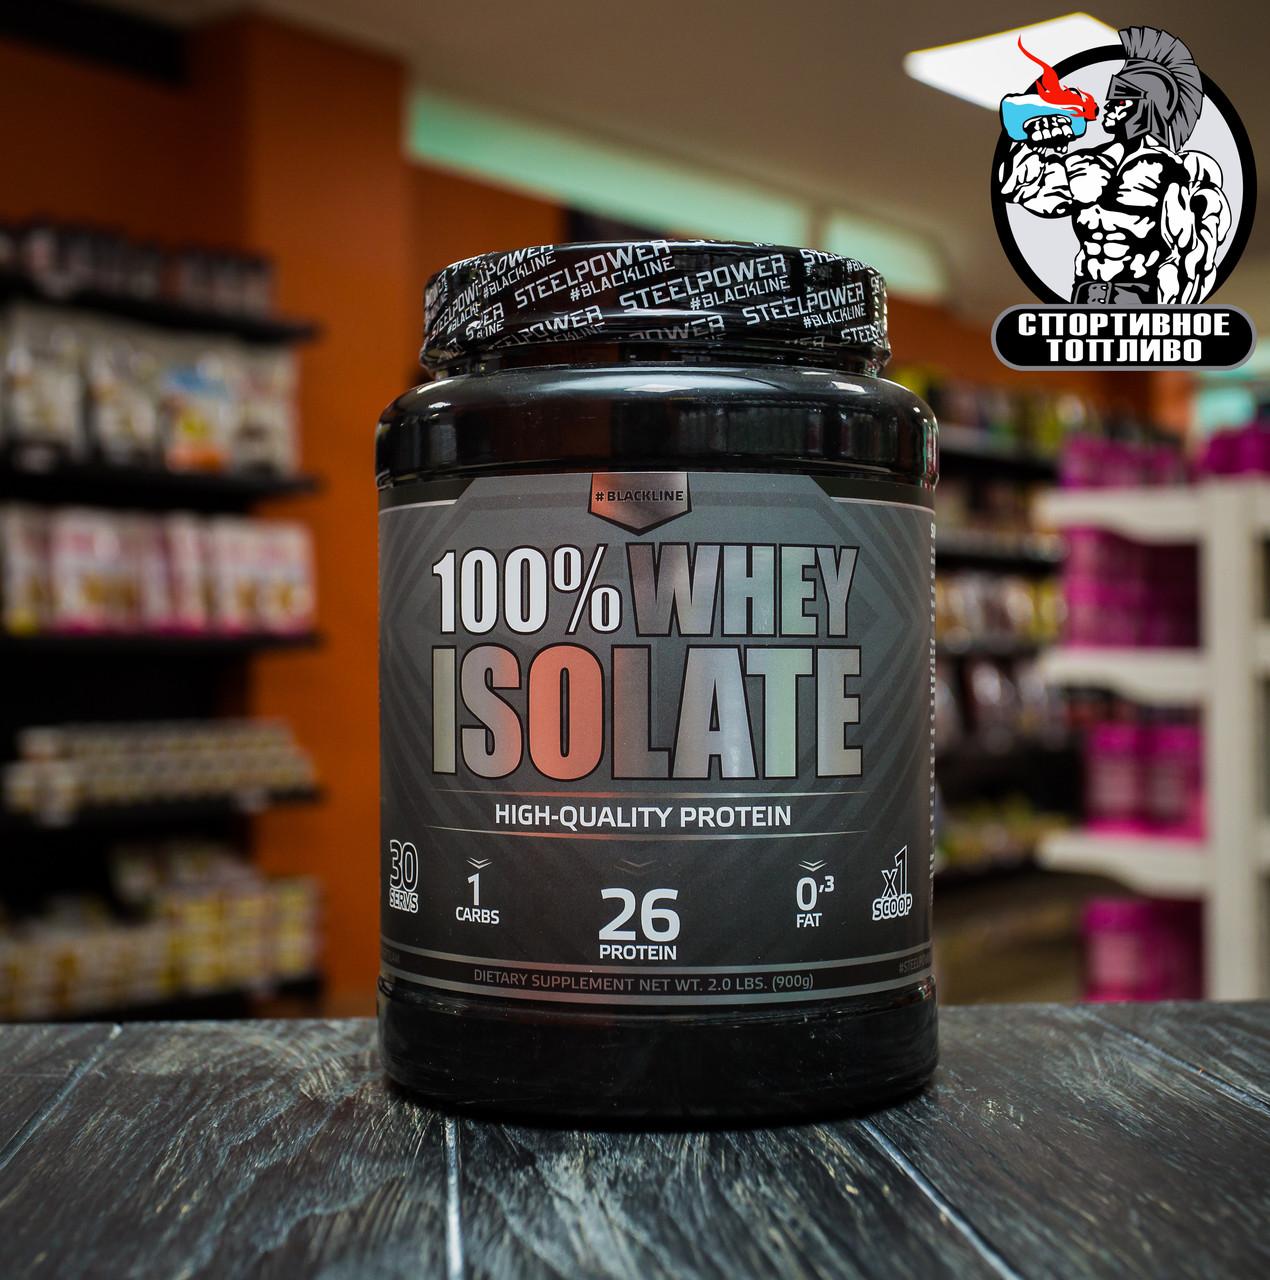 "Изолят сывороточного белка от BlackLine ""100% Whey Isolate"" 900гр/30порций"